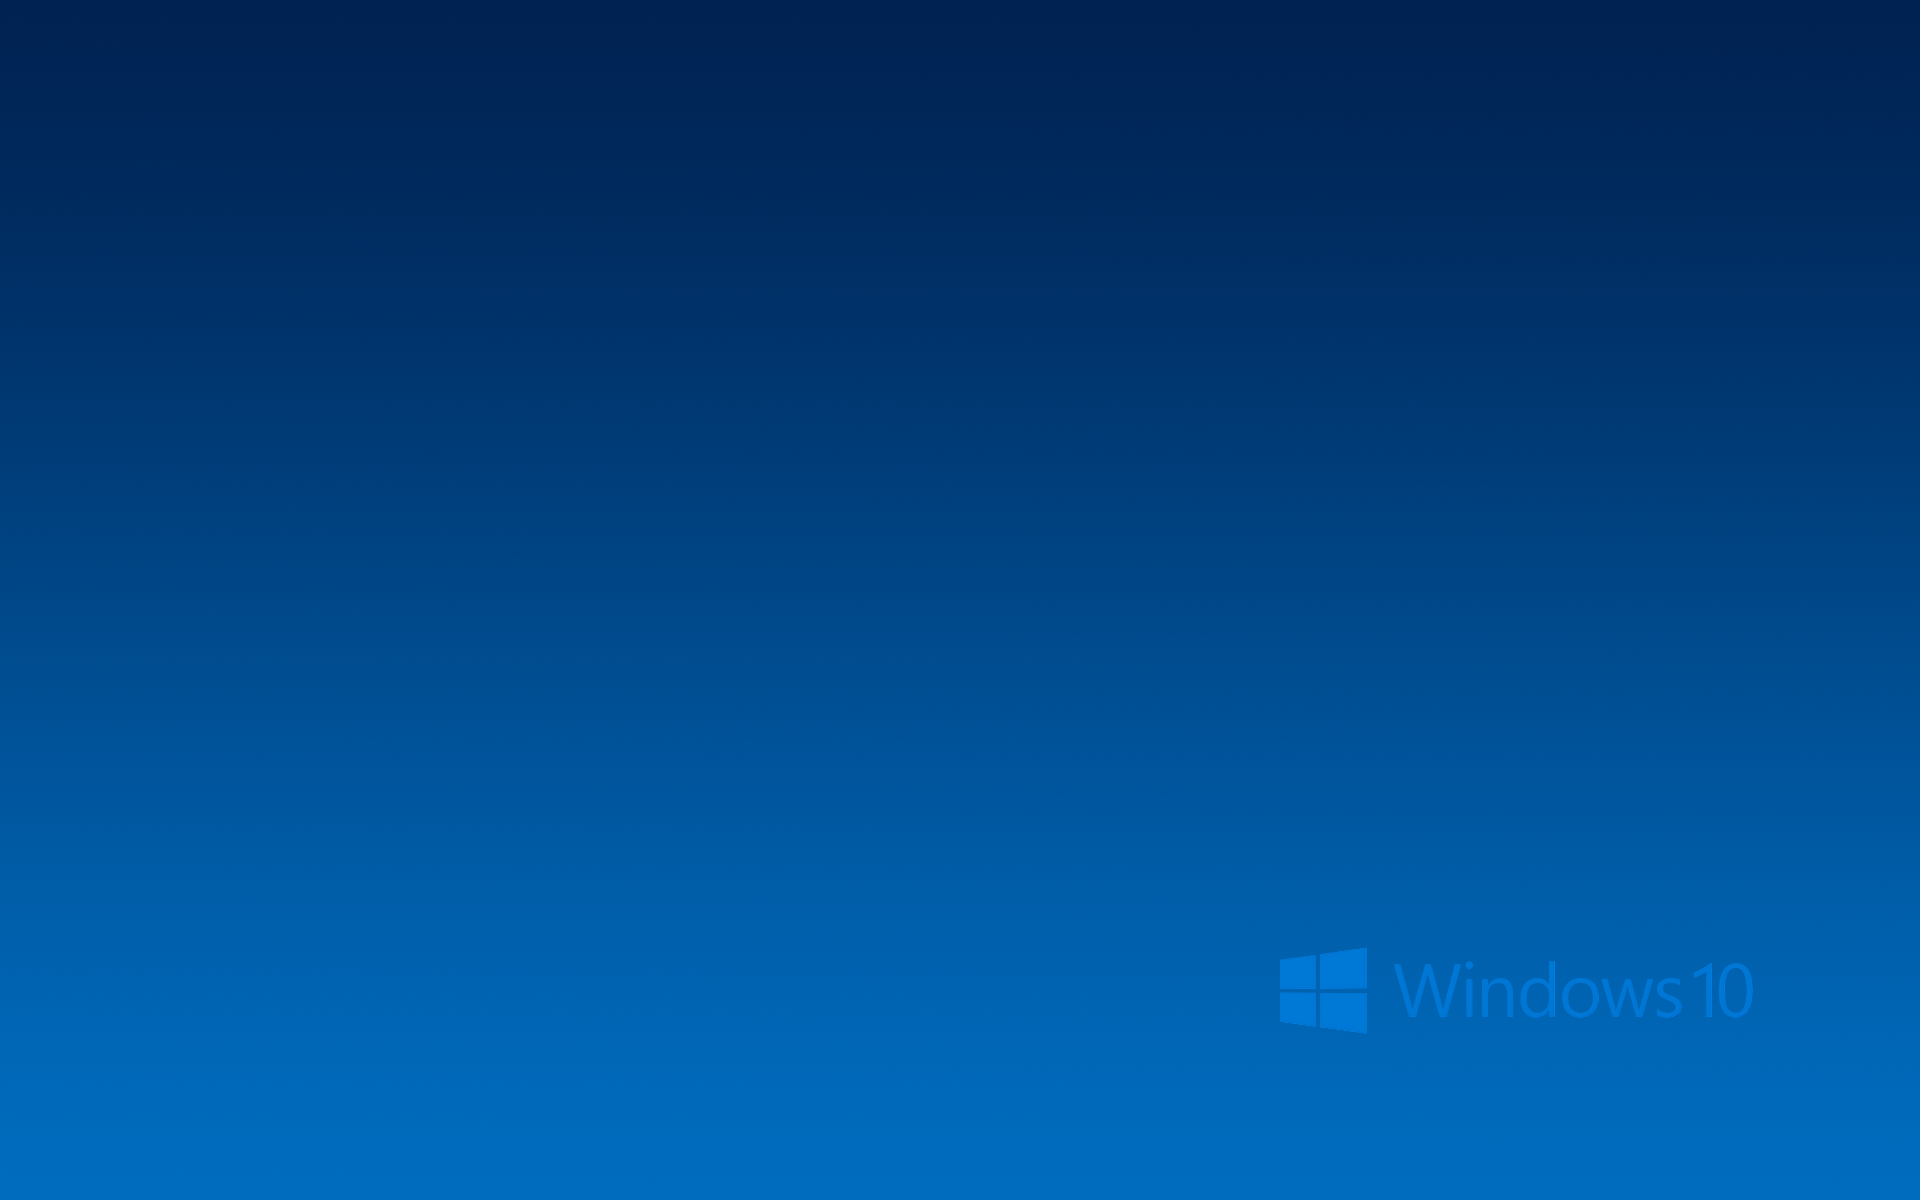 Windows 10 Wallpapers HD